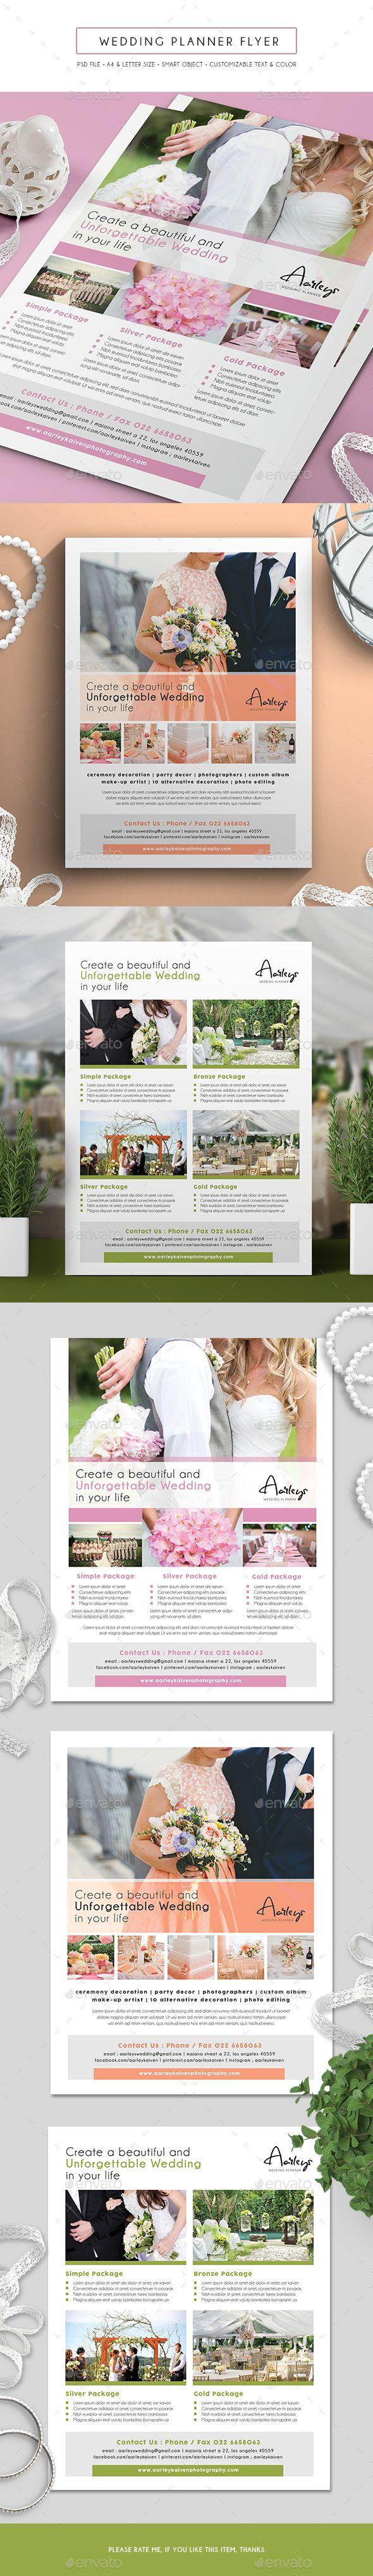 Wedding Planner Flyer - Corporate Flyers #design #flyer #template Download:  Http://graphicriver.net/item/wedding-Planner-Flyer /15882193?ref=Webdesignspider